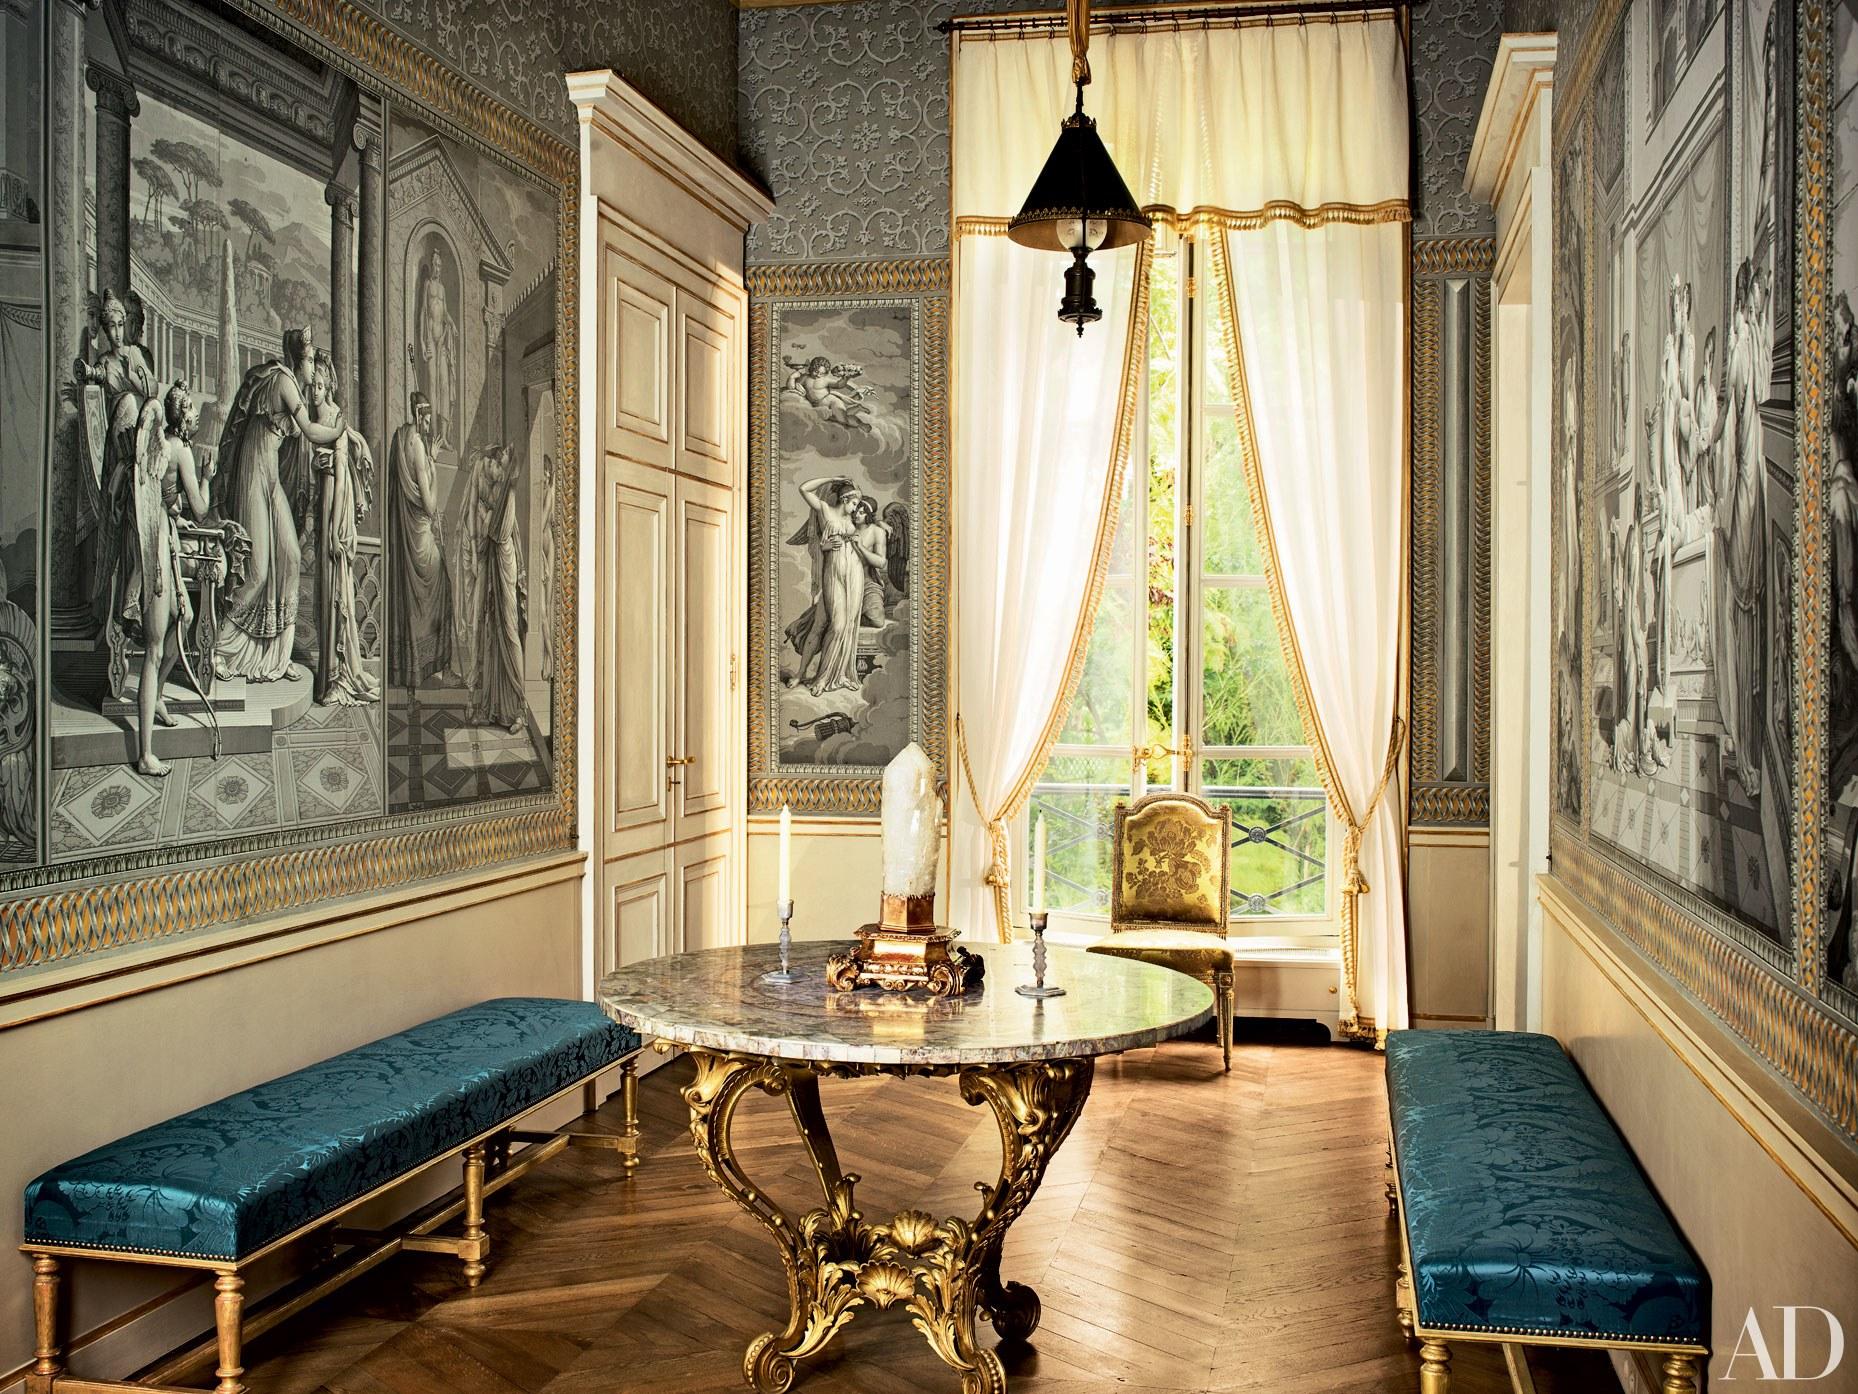 10 Italian Interior Designers You Need To Know italian interior designer 10 Italian Interior Designers You Need To Know studio peregalli